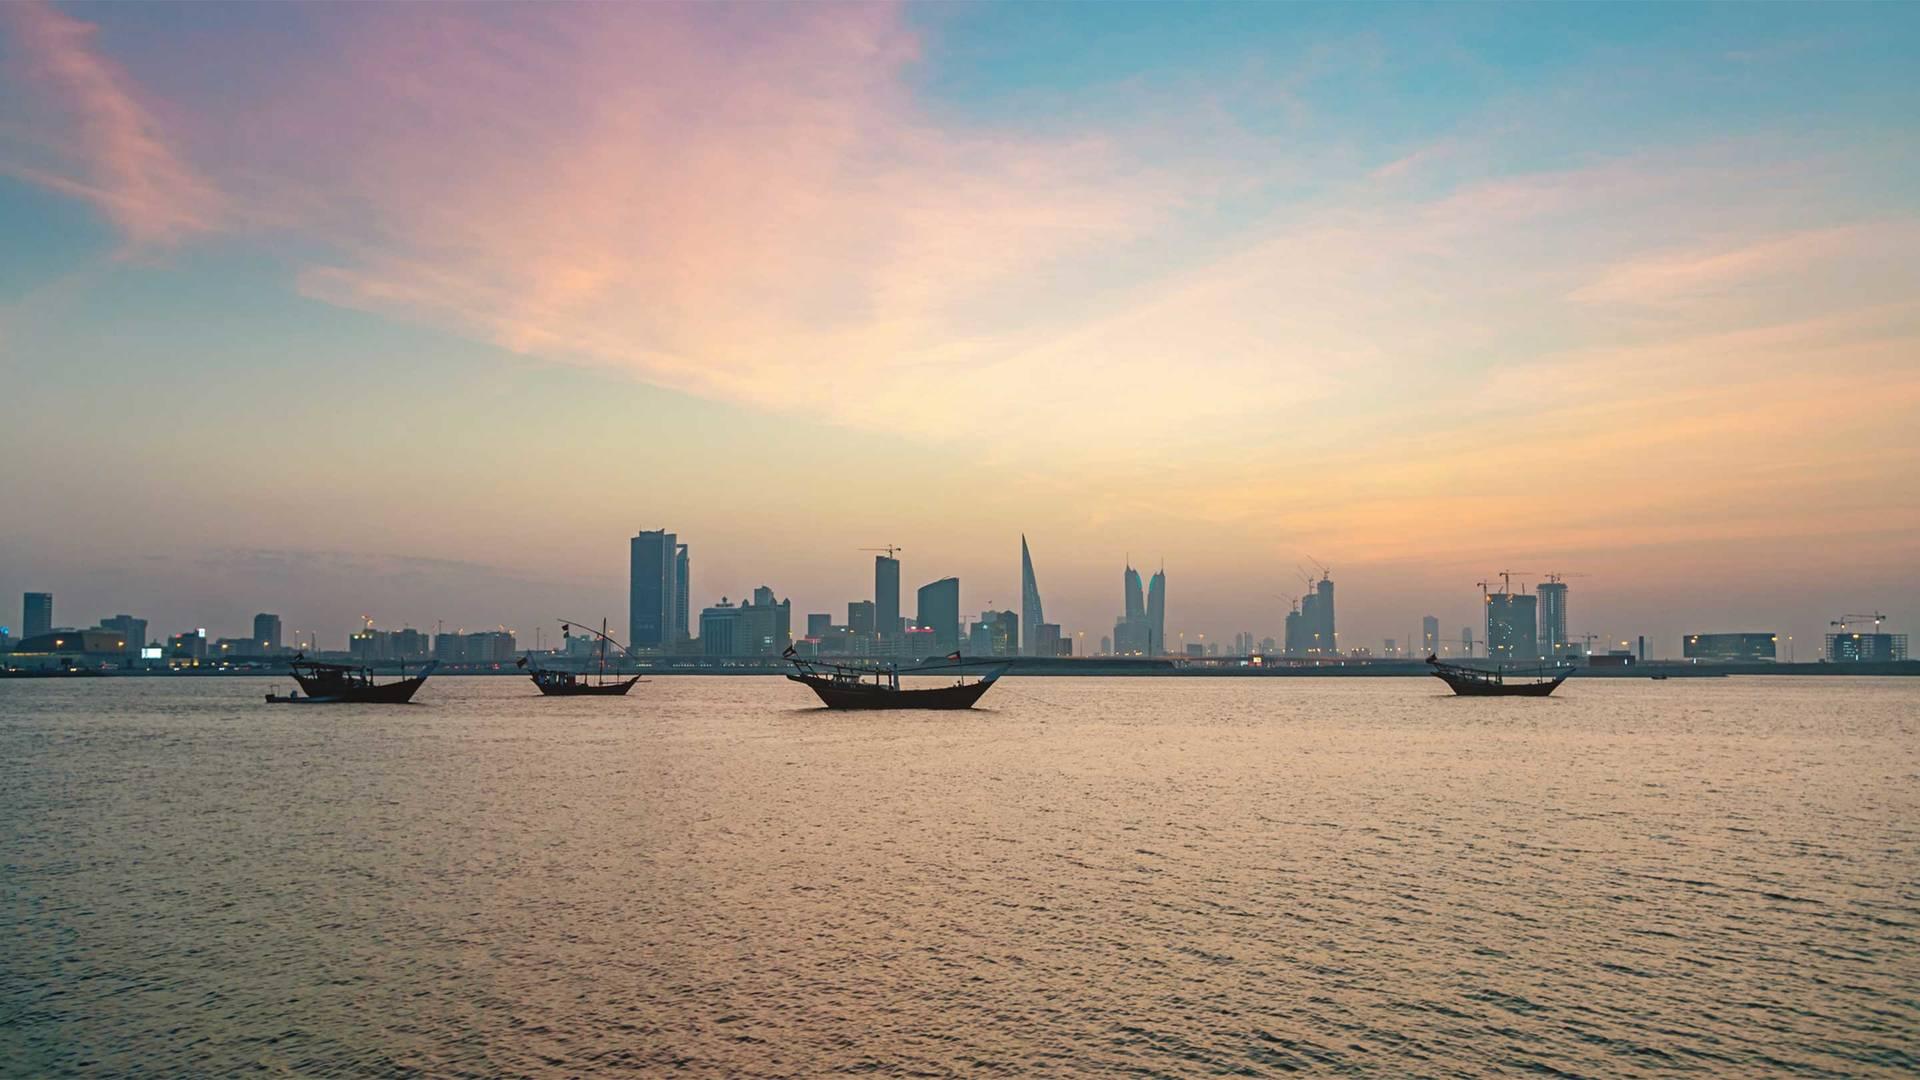 16-9 Bahrainatdusk sunset